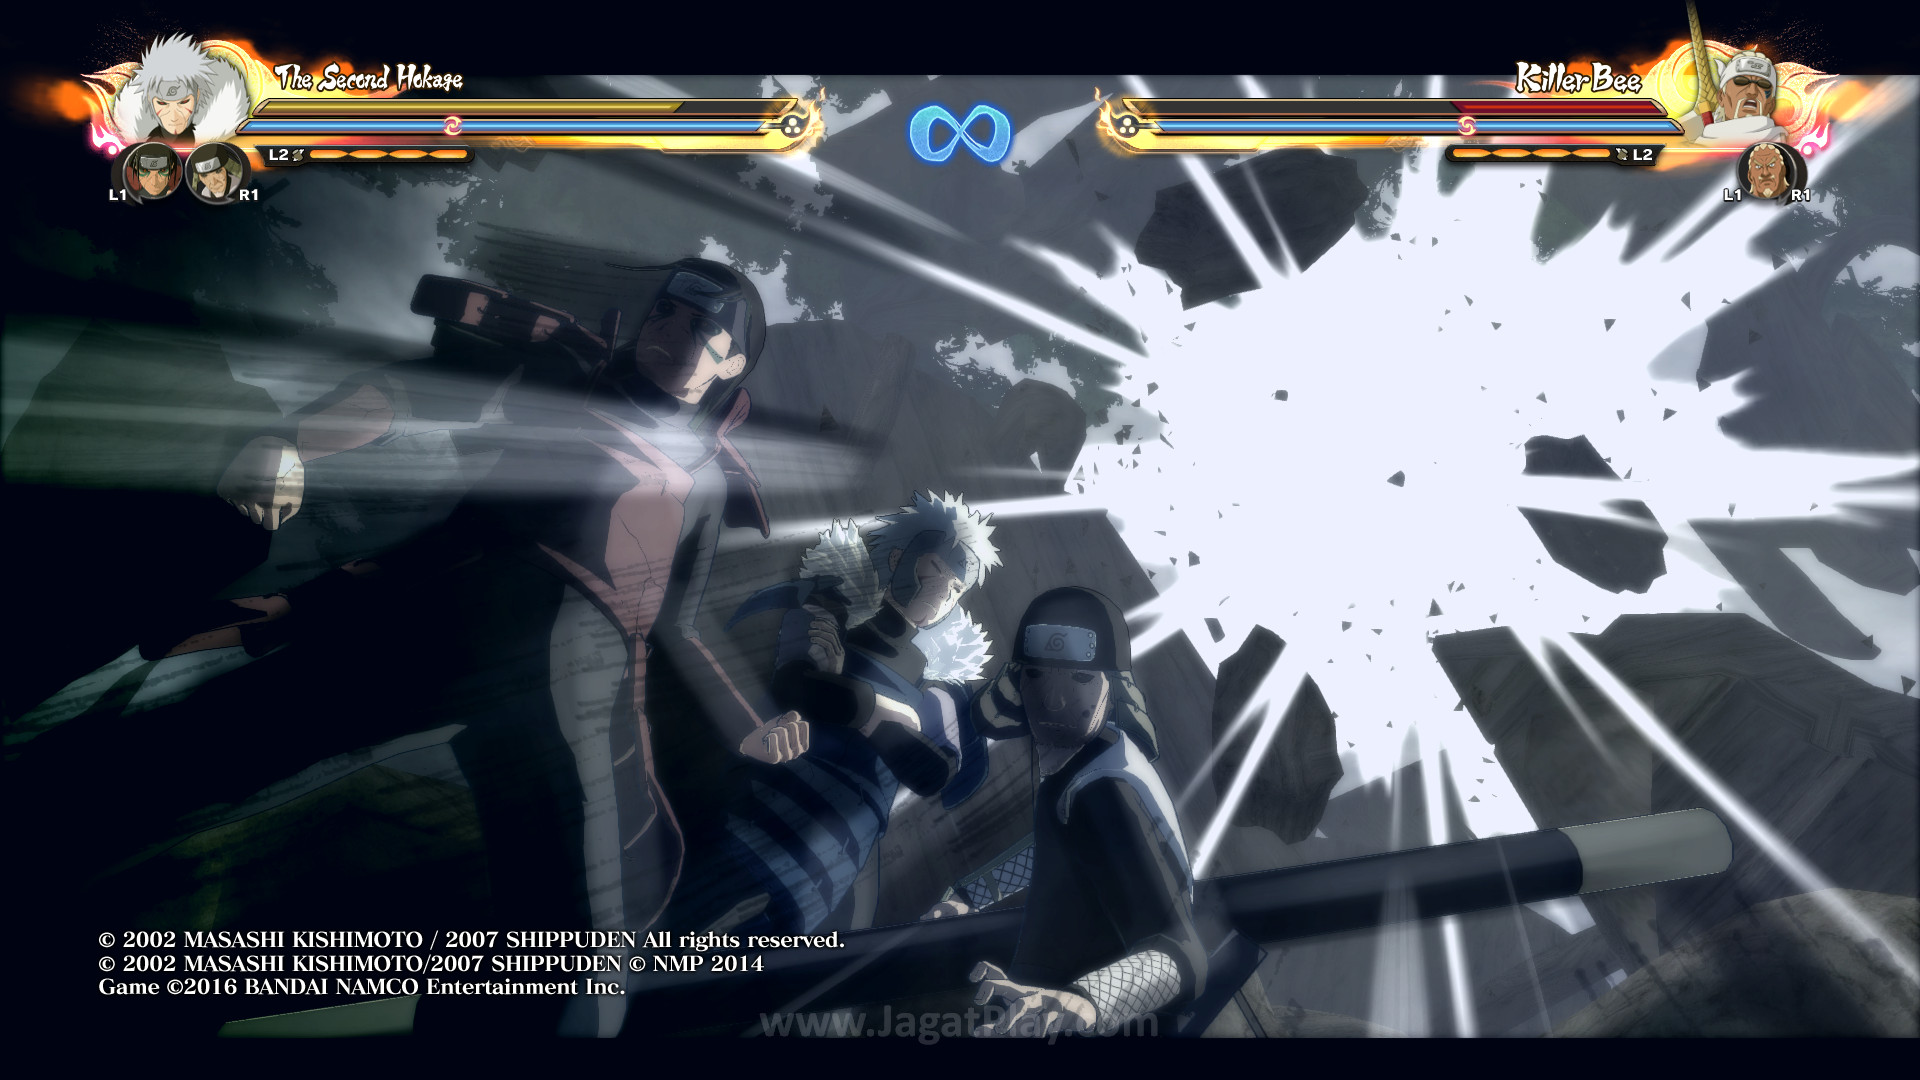 Preview Naruto Shippuden Ultimate Ninja Storm 4: Titik Akhir